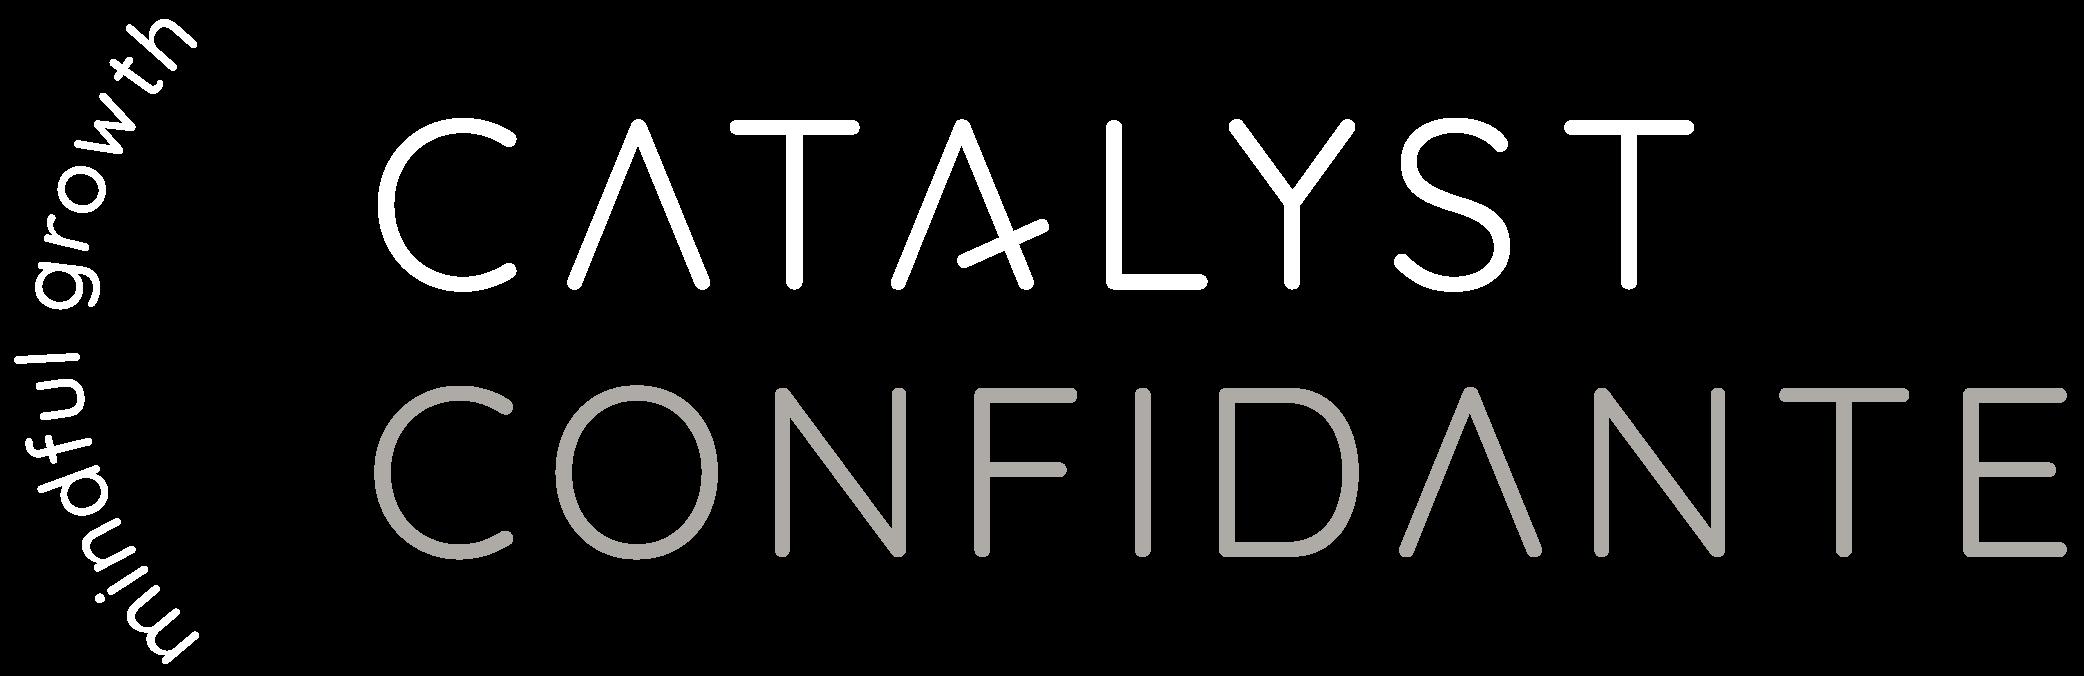 Catalyst Confidante